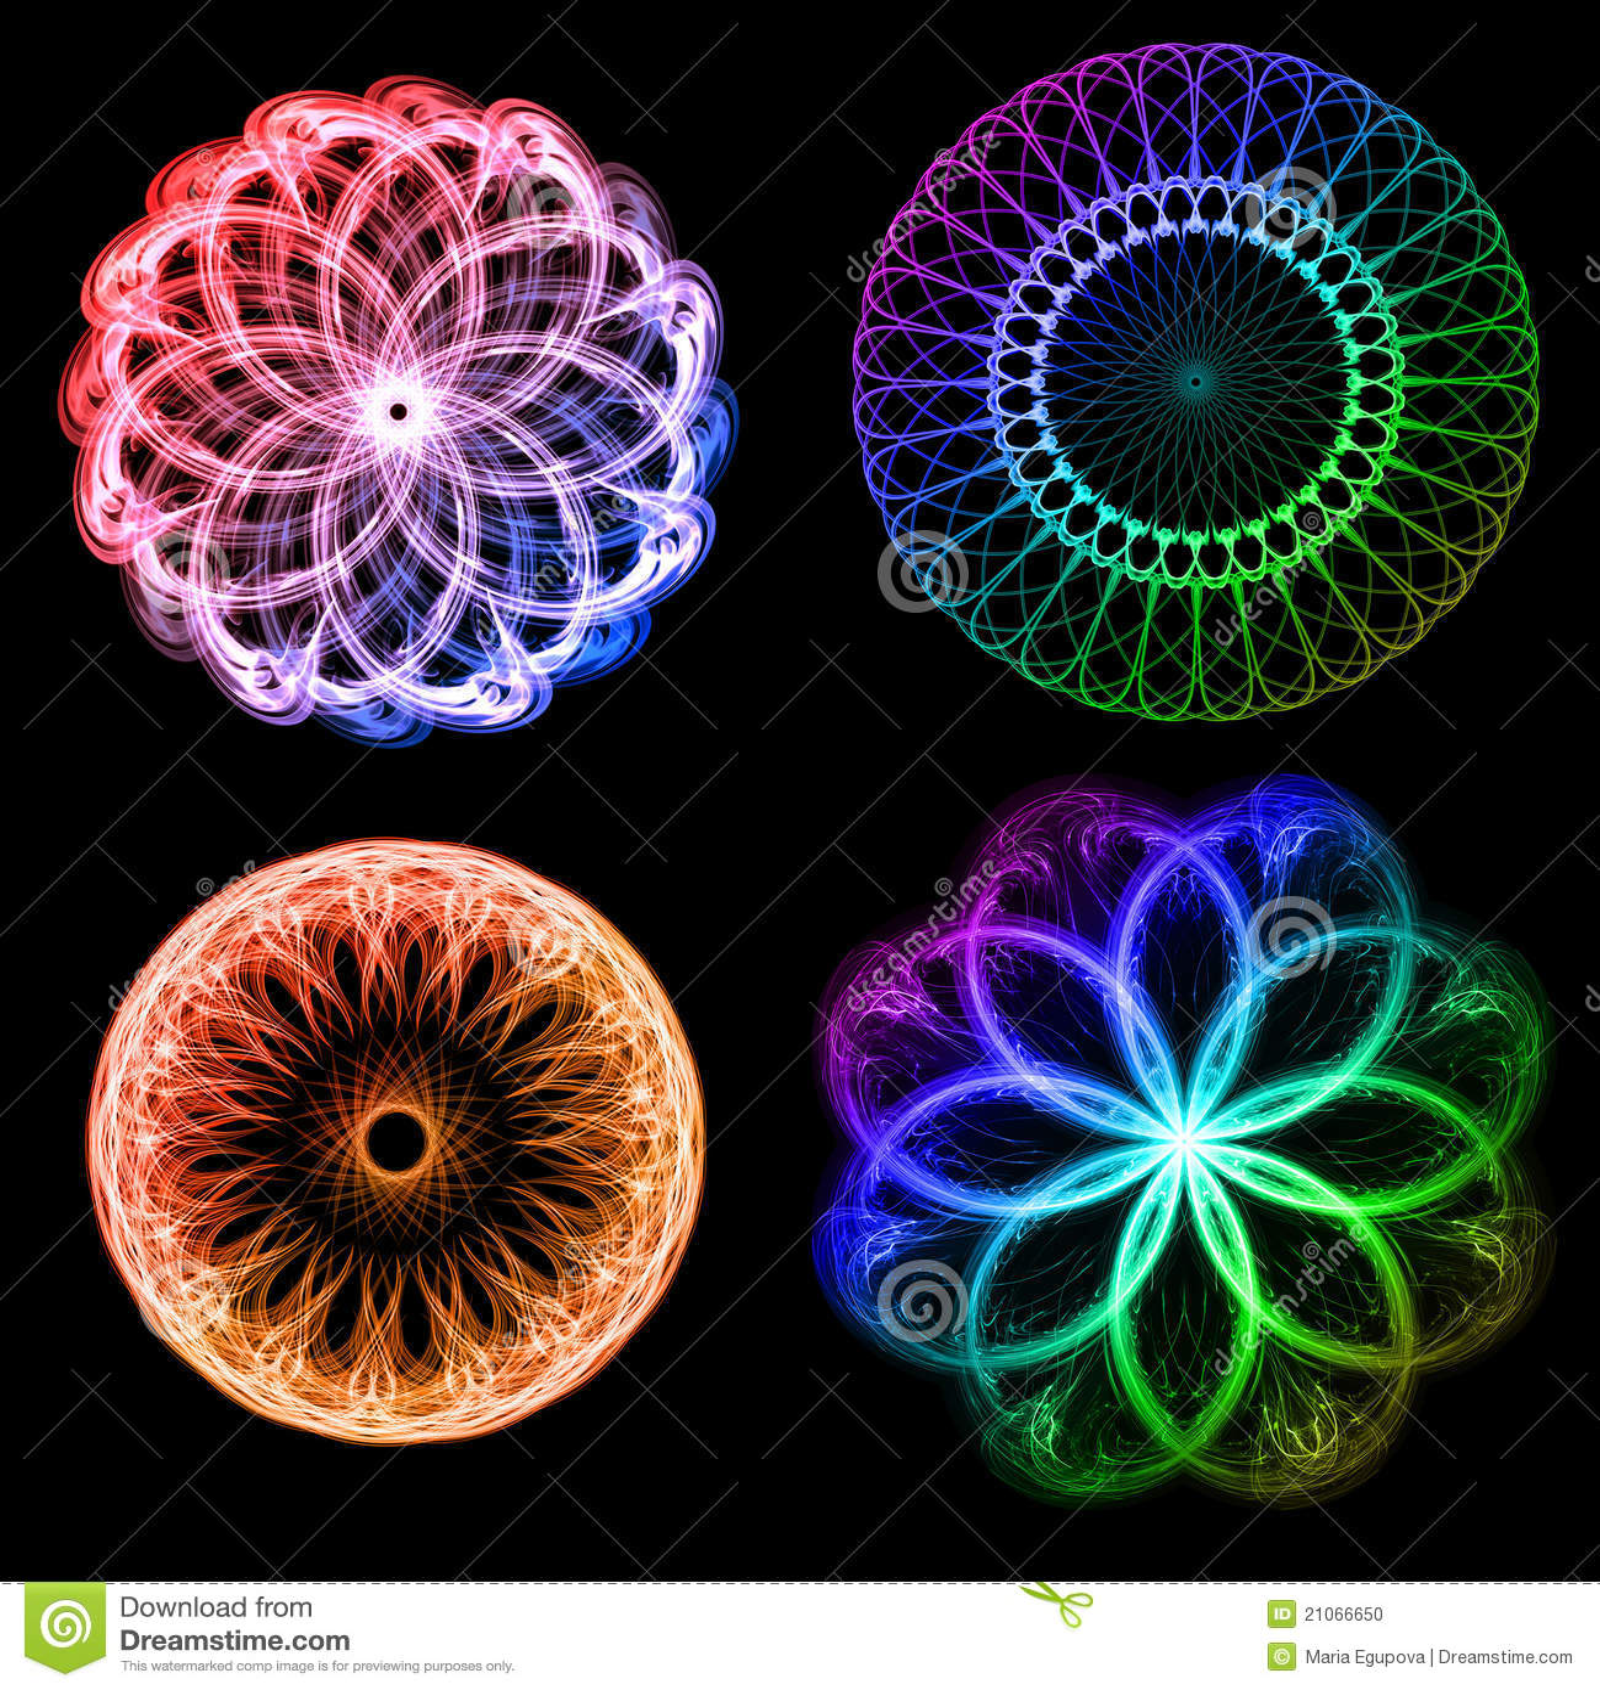 Fractal Black Flower Free Stock Photo: Flowers Fractals Stock Illustration. Illustration Of Tech